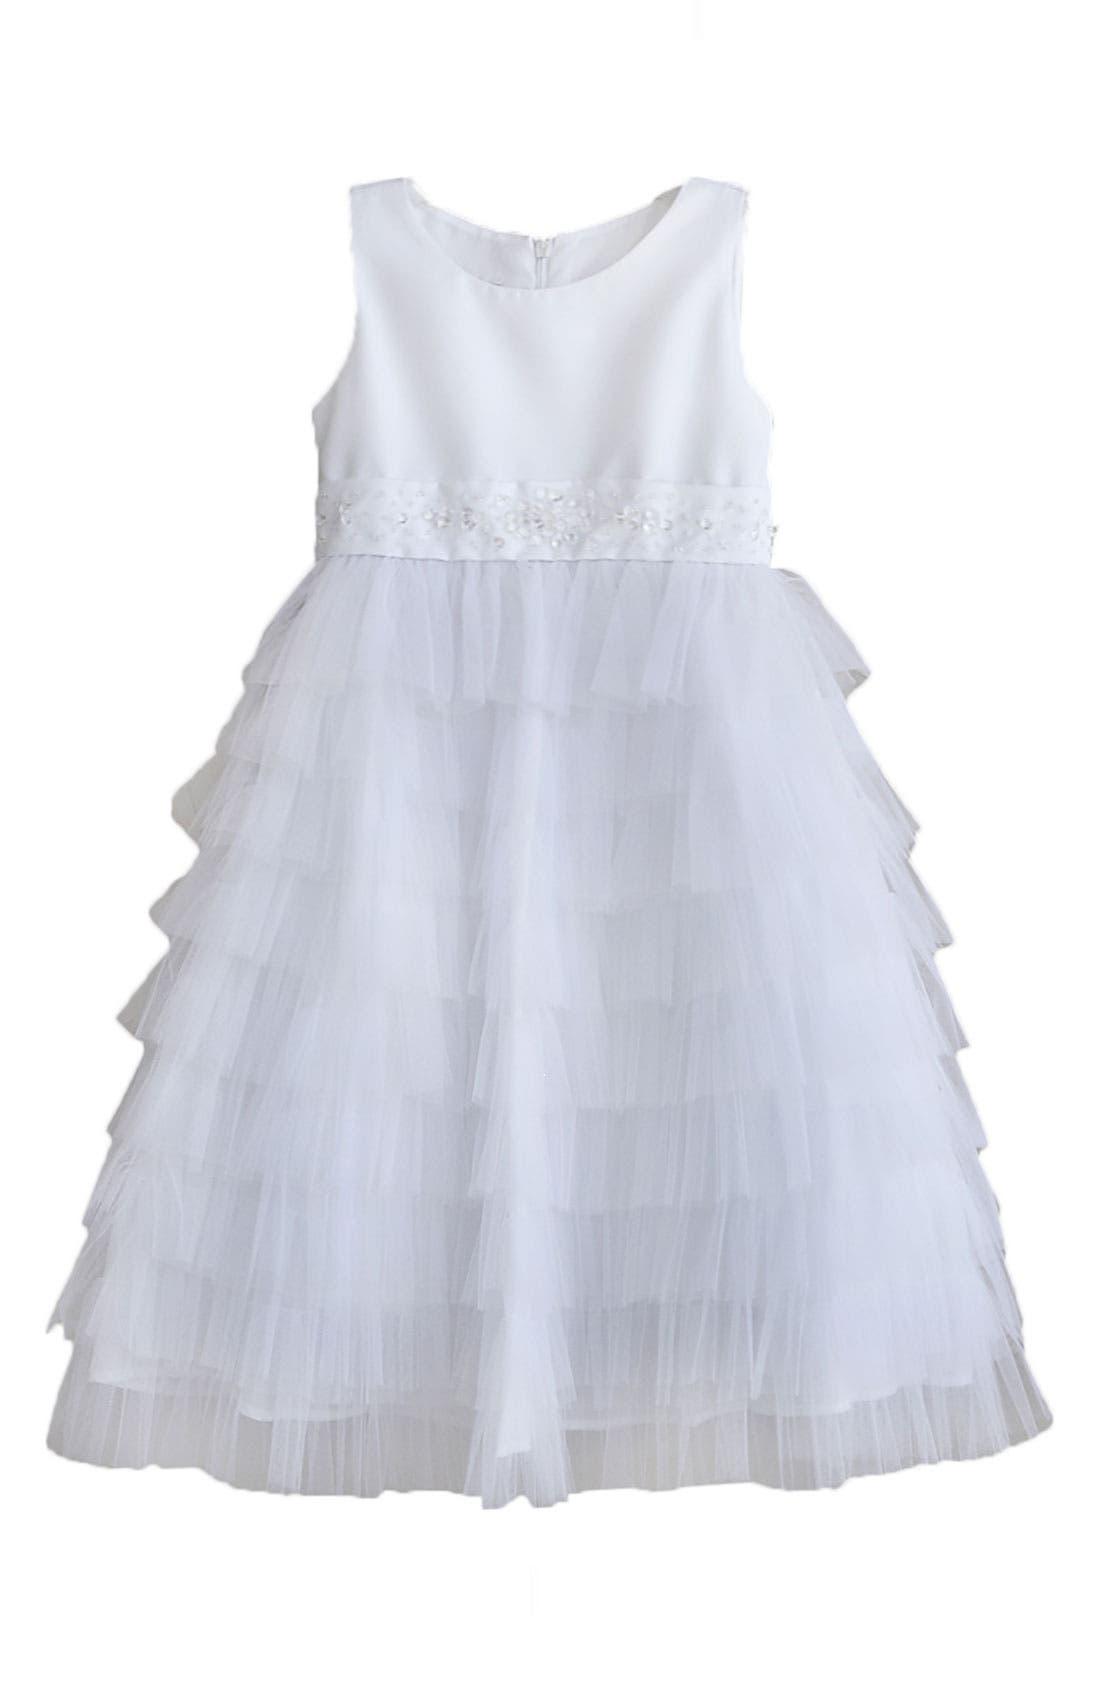 Alternate Image 1 Selected - Isobella & Chloe Tiered Dress (Little Girls & Big Girls)